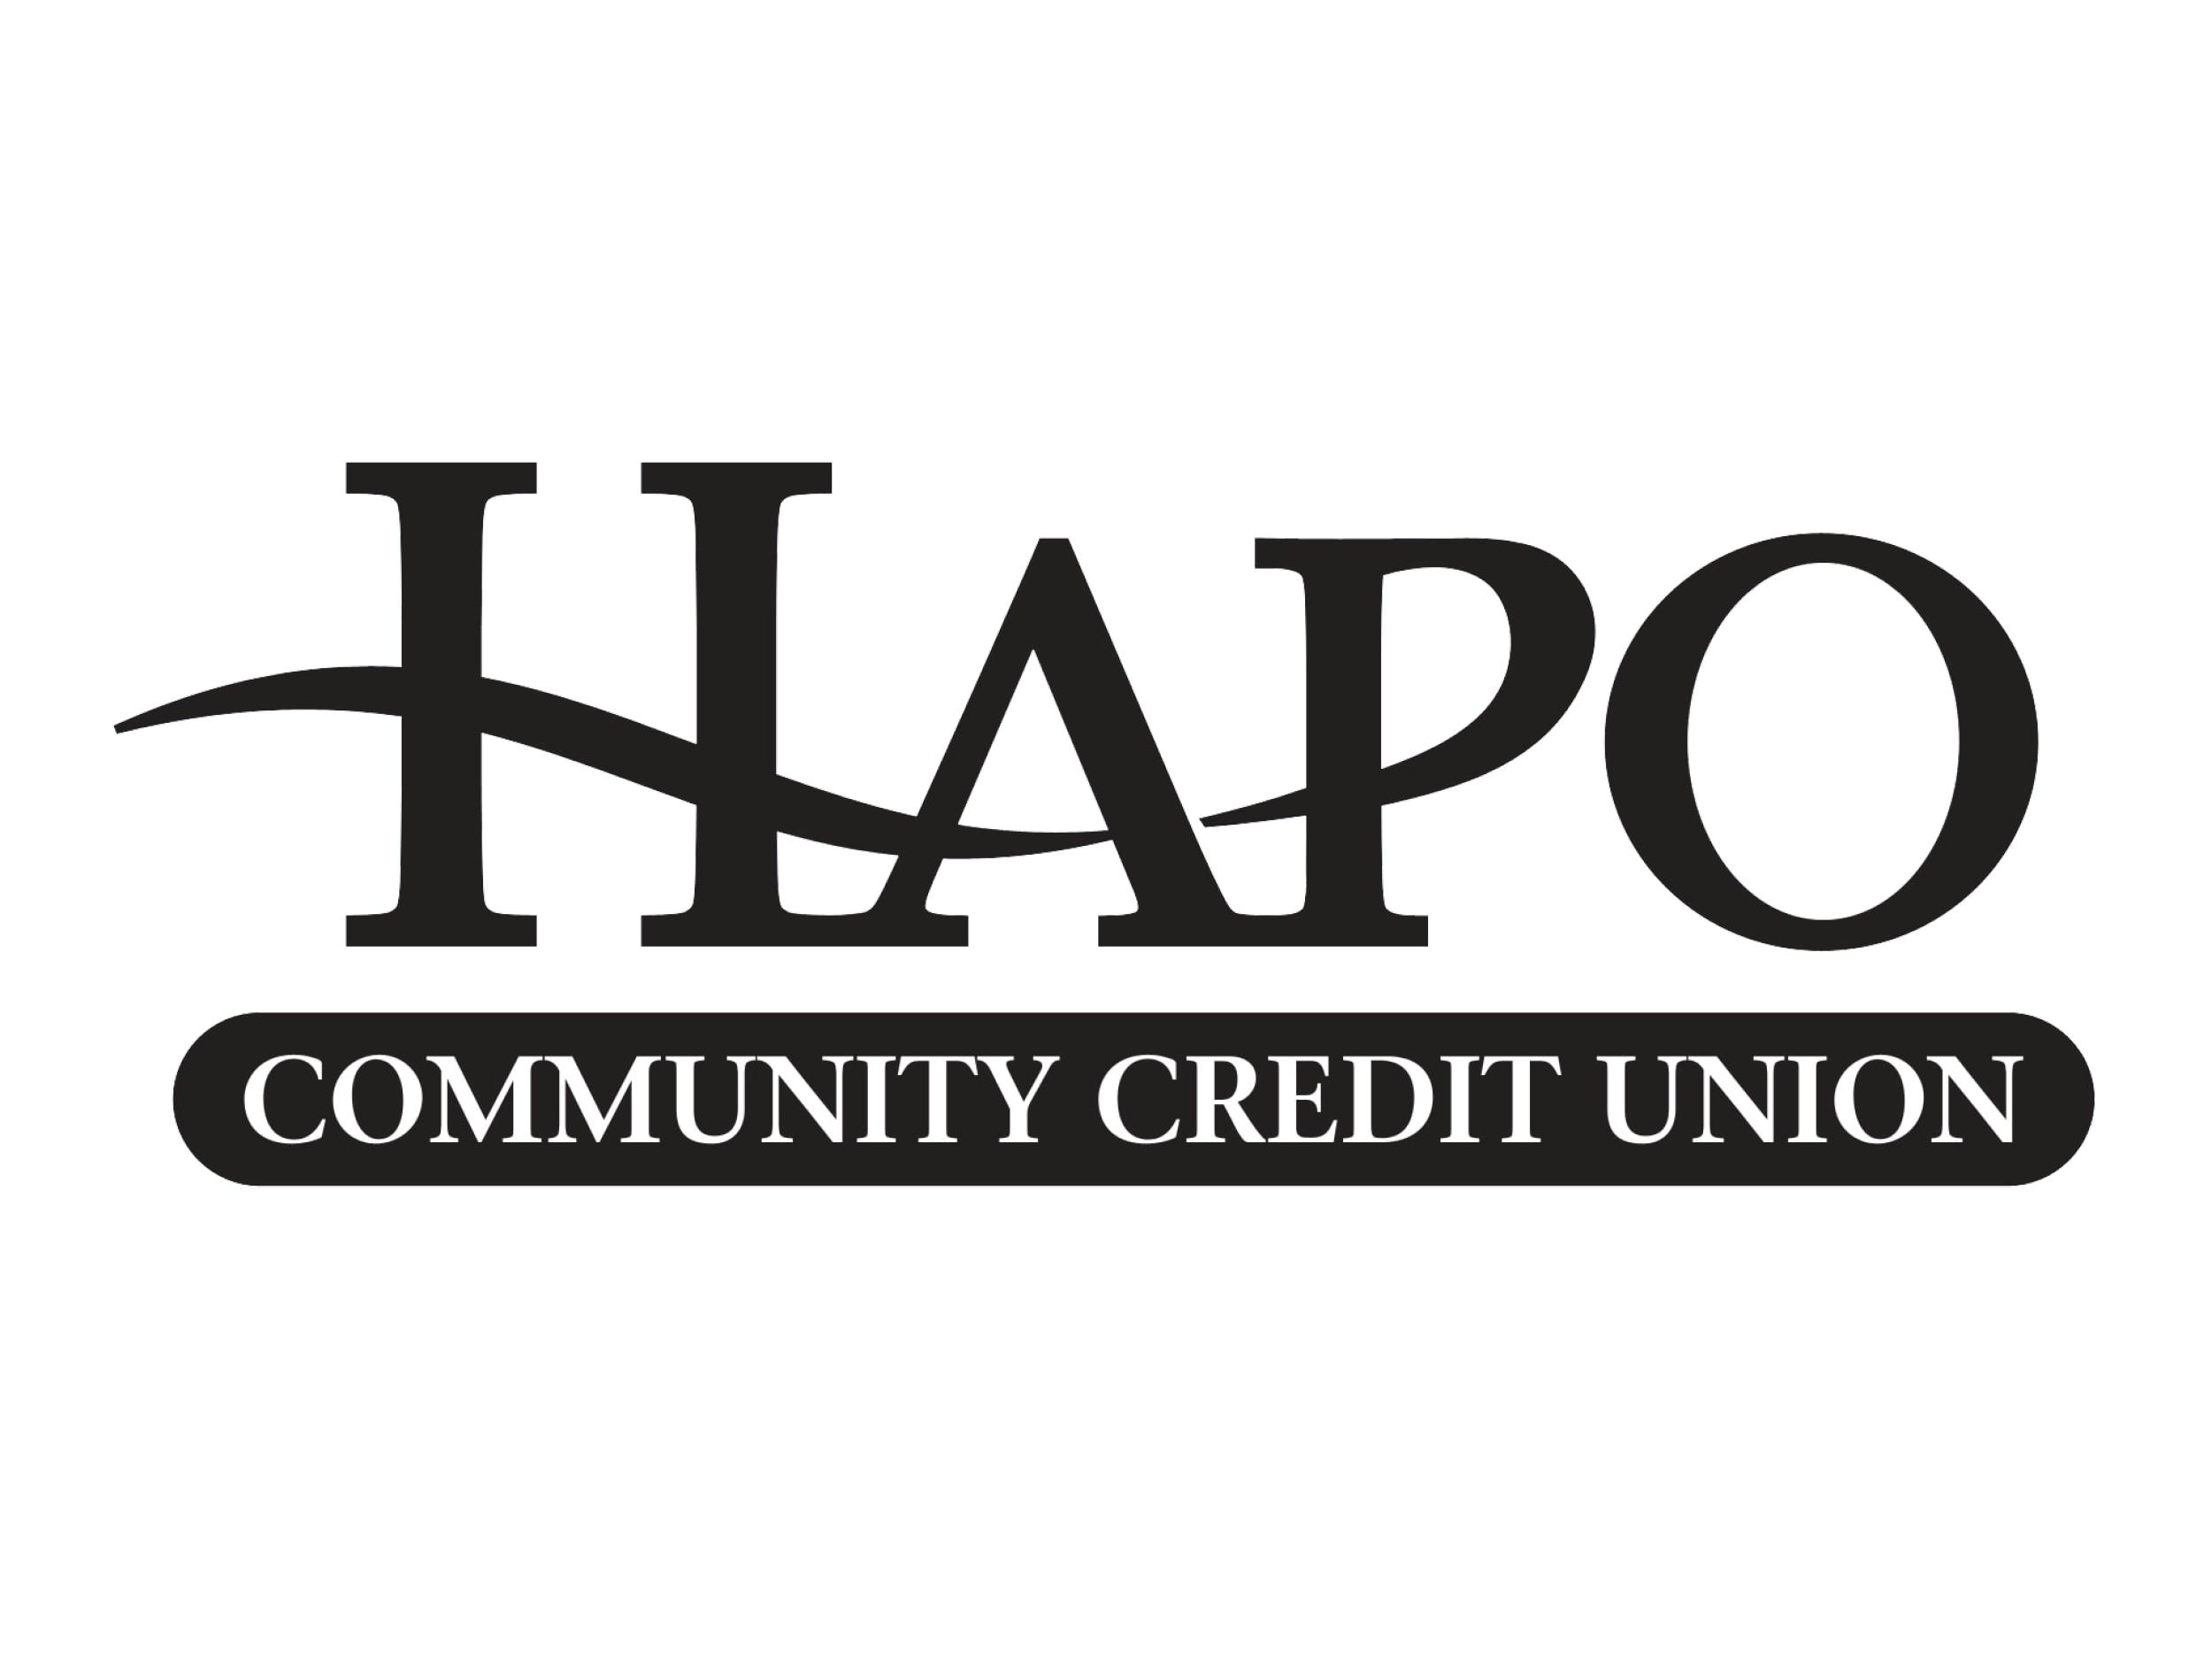 Feature: https://www.hapo.org/